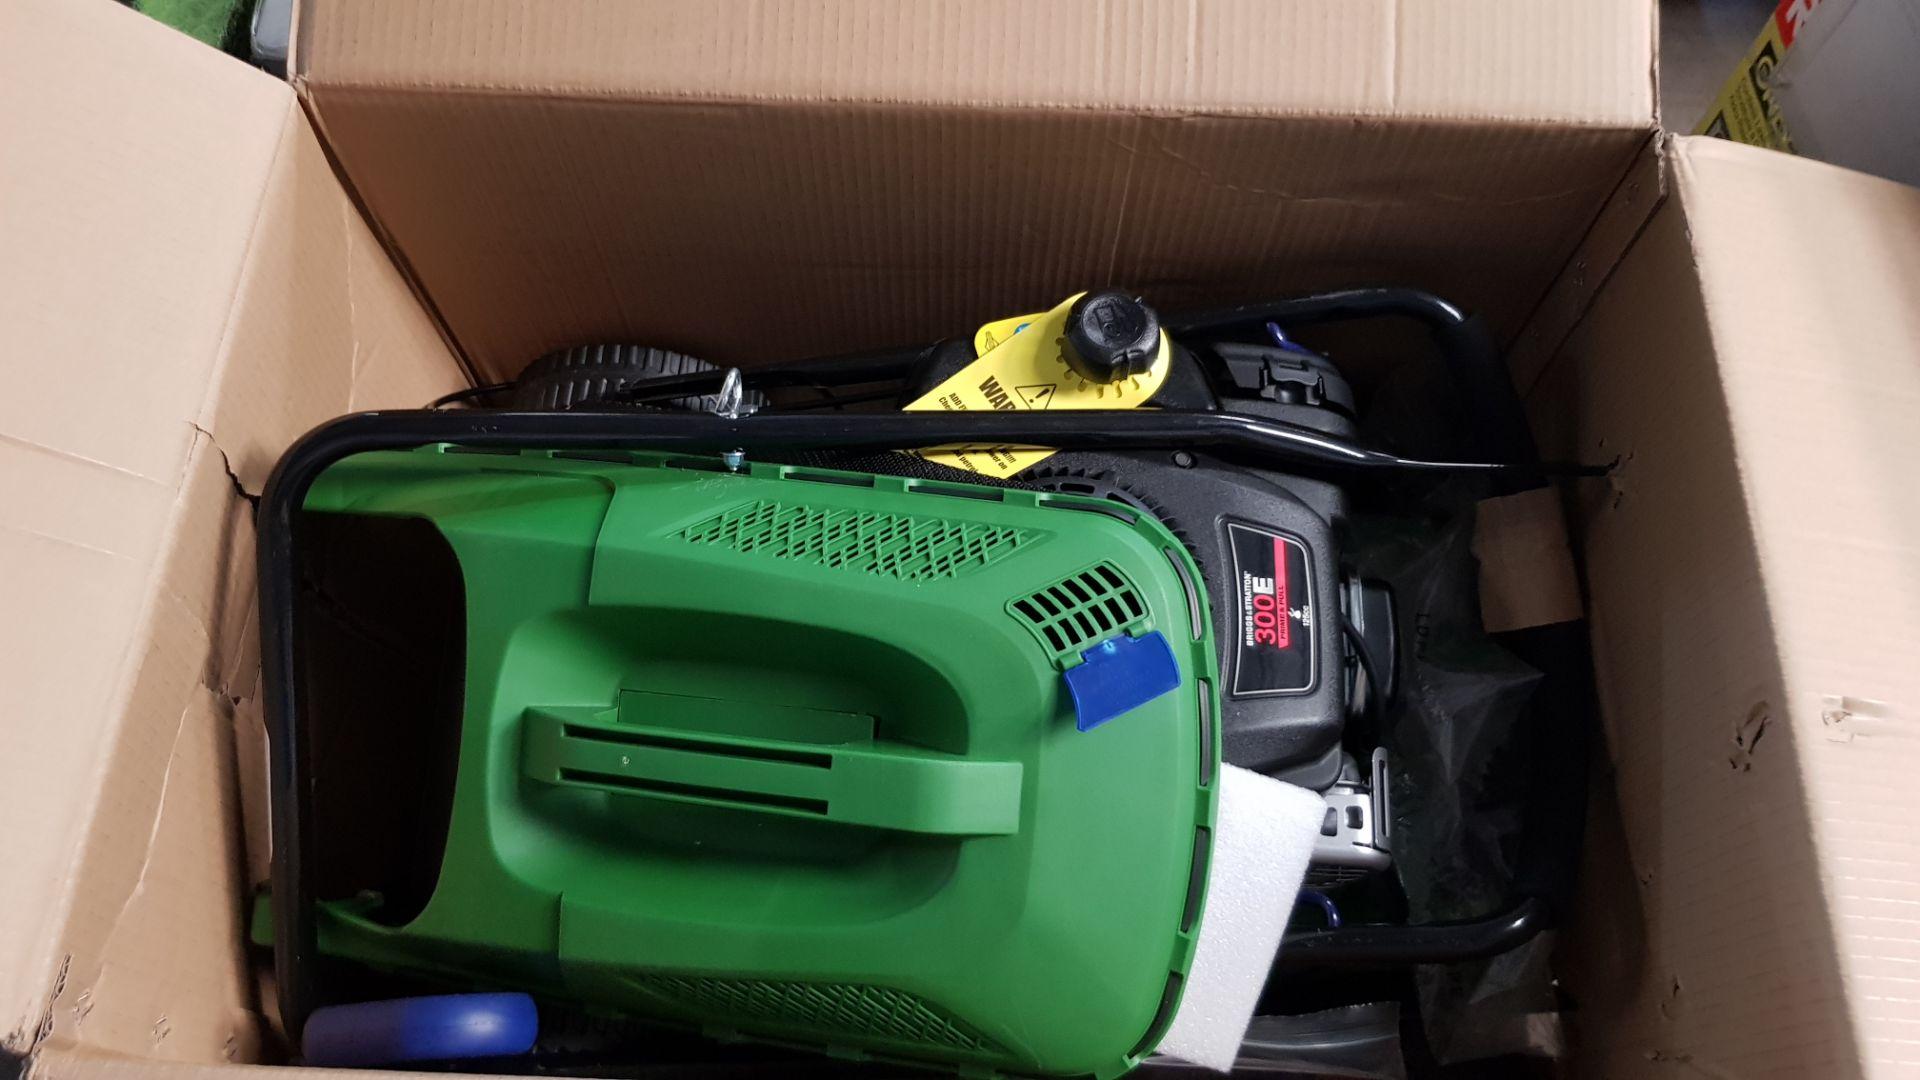 (P5) 1x Powerbase 41cm 125cc Pish Petrol Rotary Lawn Mower. RRP £199.00. Unit Is Clean, Appears N - Image 4 of 5